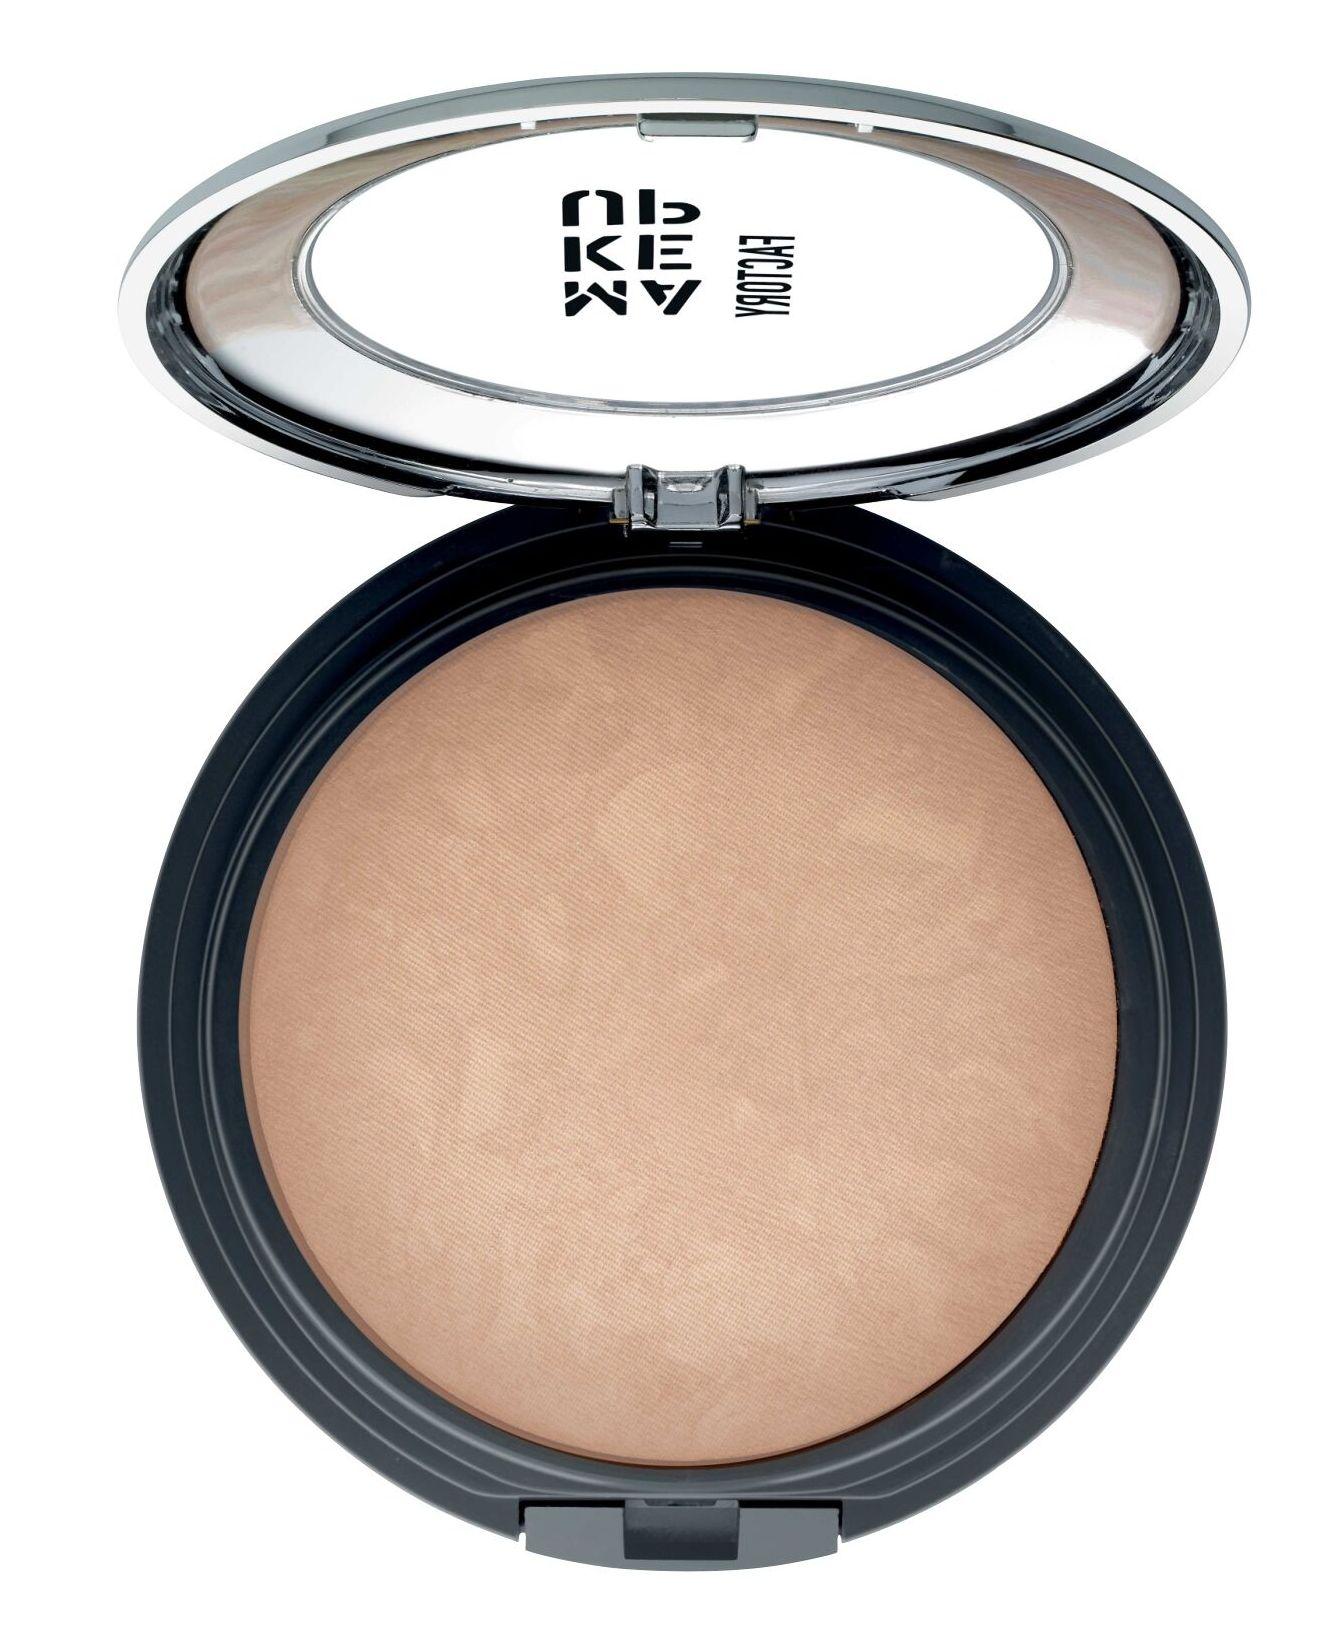 MAKE UP FACTORY Пудра запеченная бронзирующая с эффектом сияния, 05 светлый загар / Touch of Tan Bronzer 9,5 г фото